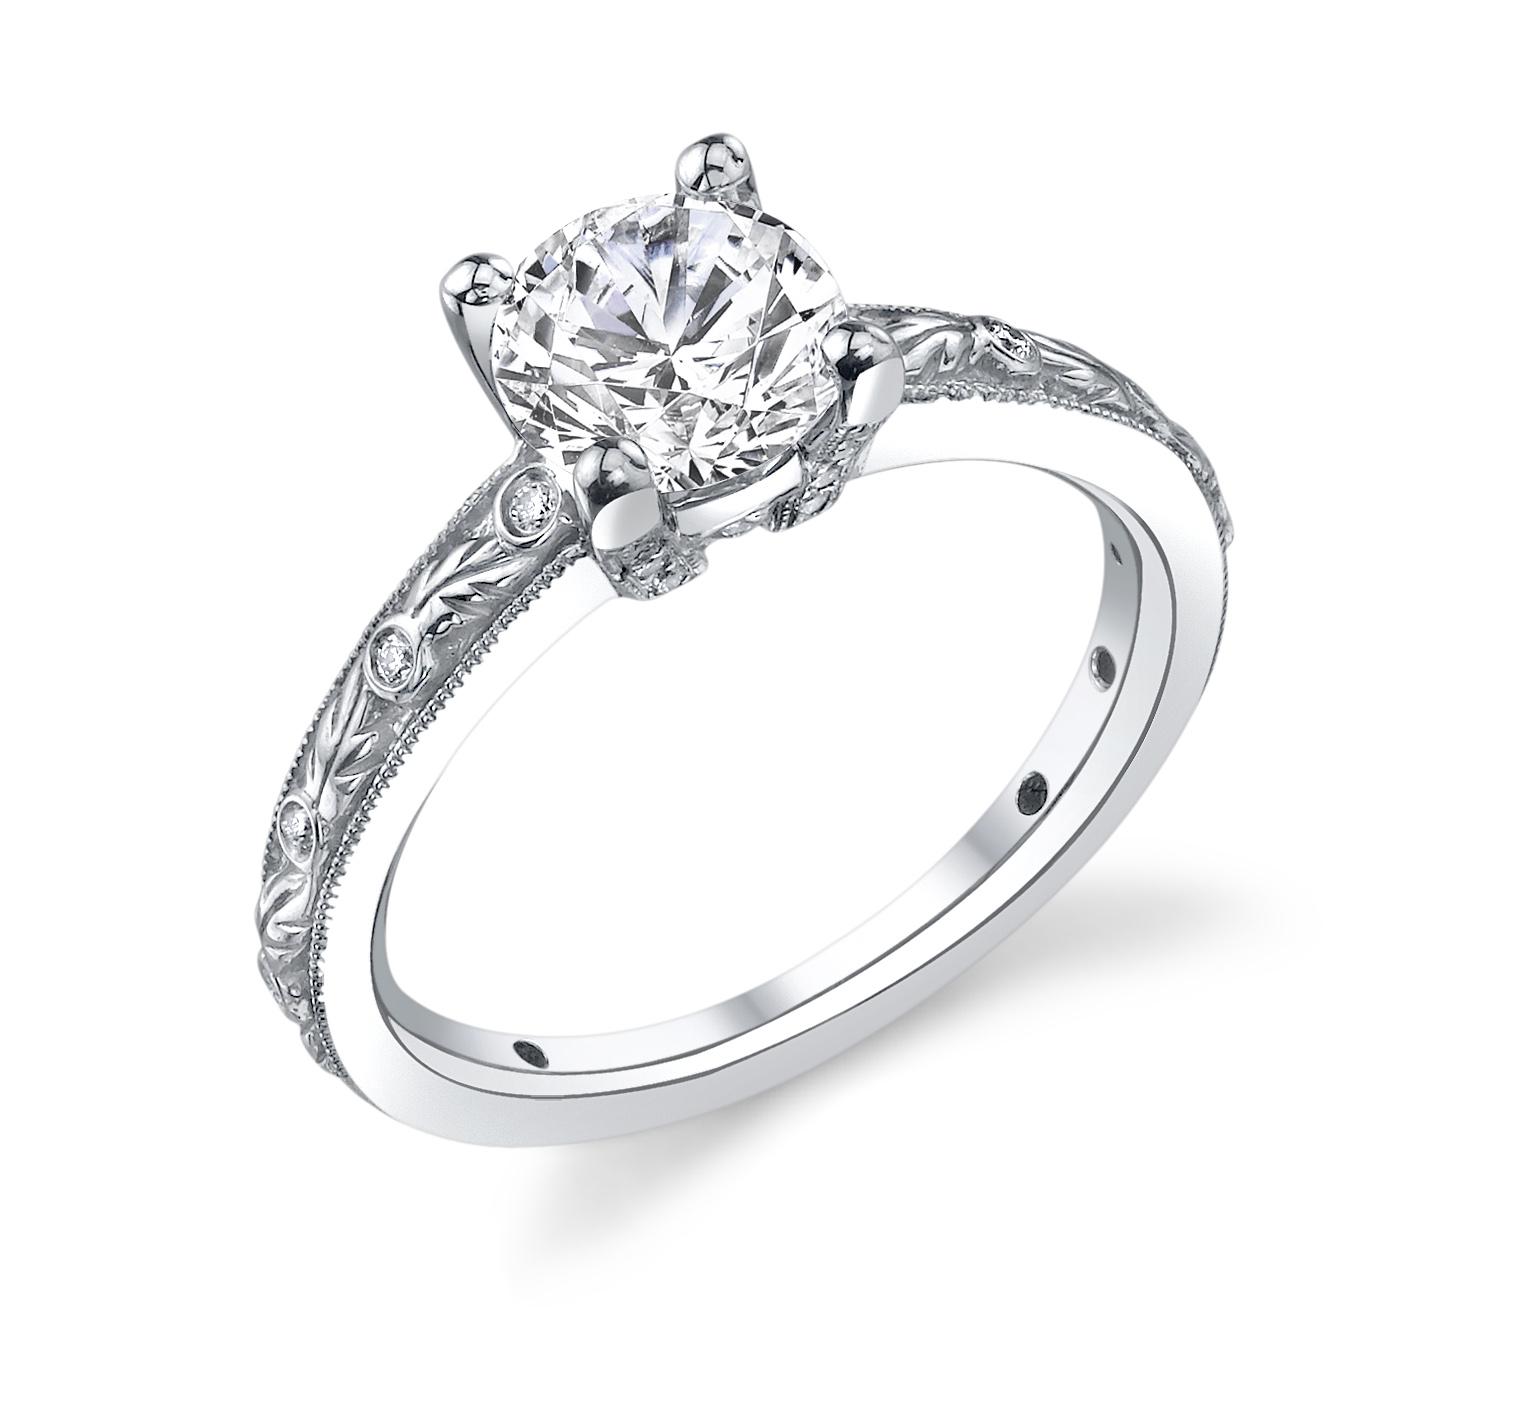 Ritani Engagement Ring From Robbins Brothers (sku 0376459)